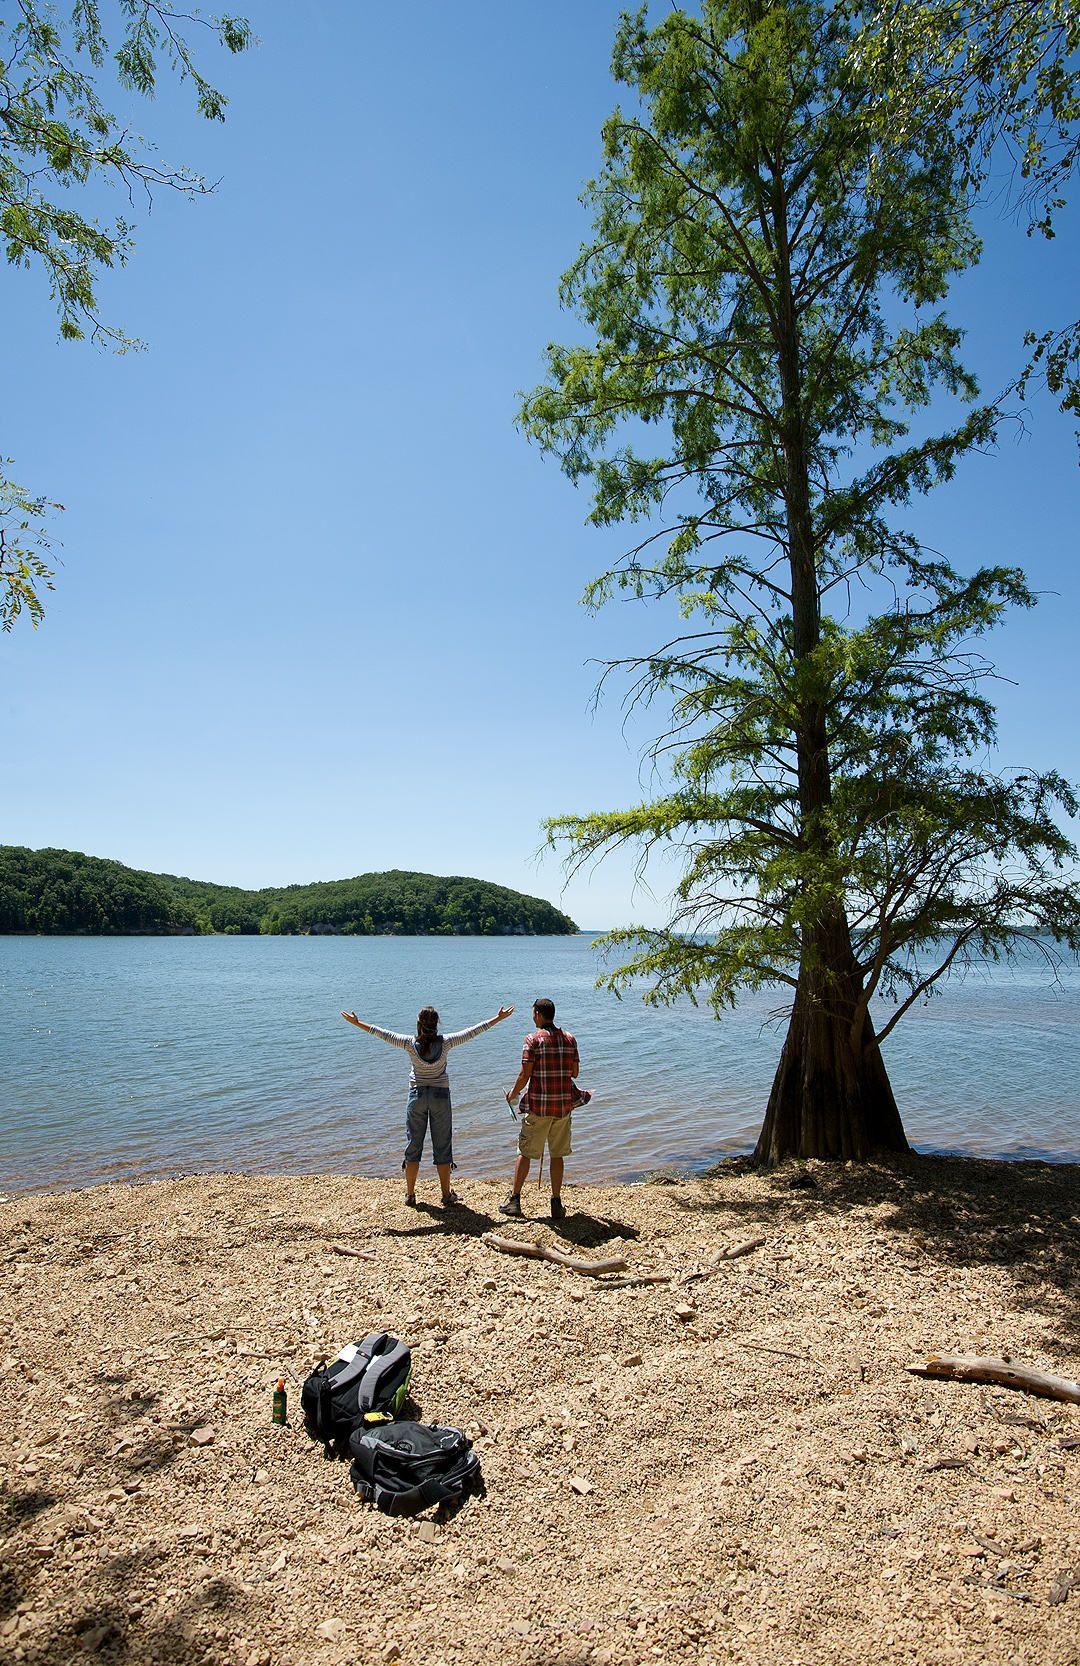 Land Between the Lakes, Kentucky